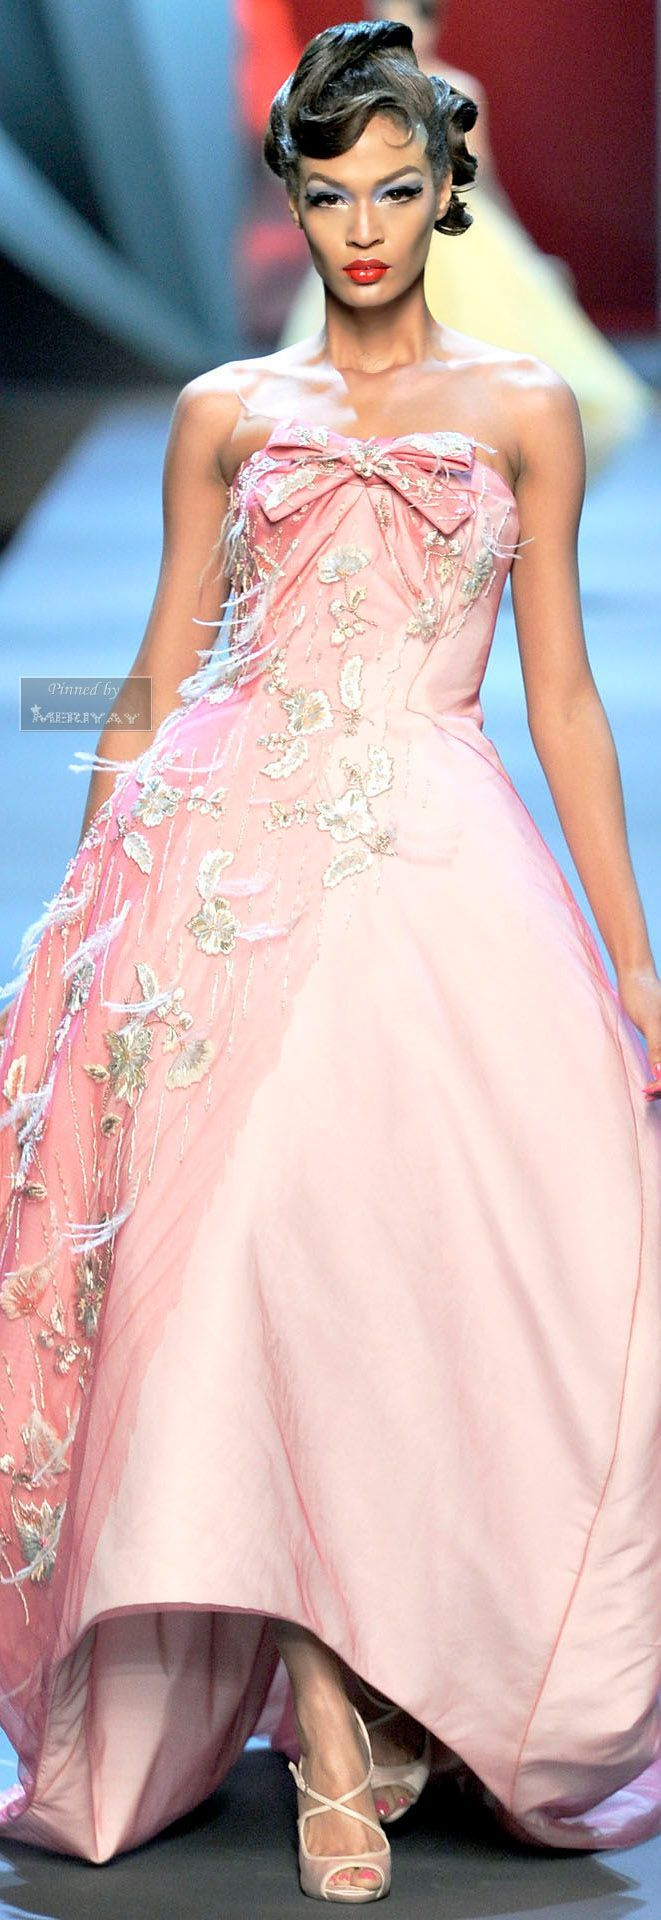 Pin by Myrna Alvarez on ~ Pretty Pinks ~ | Pinterest | Beautiful ...